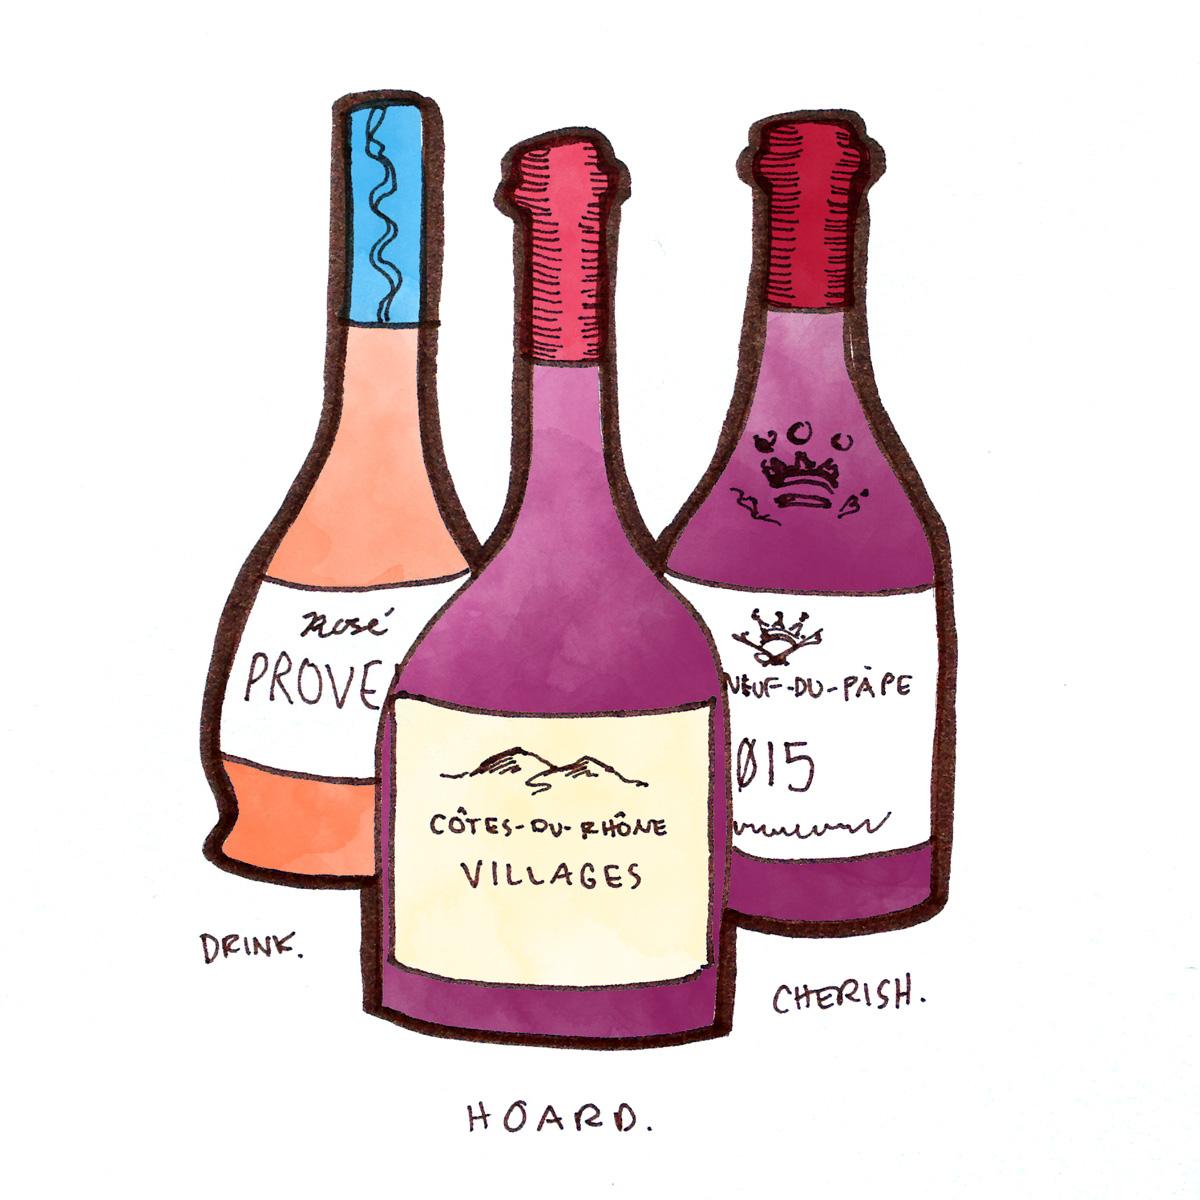 cotes-du-rhone-bottle-illustration-winefolly